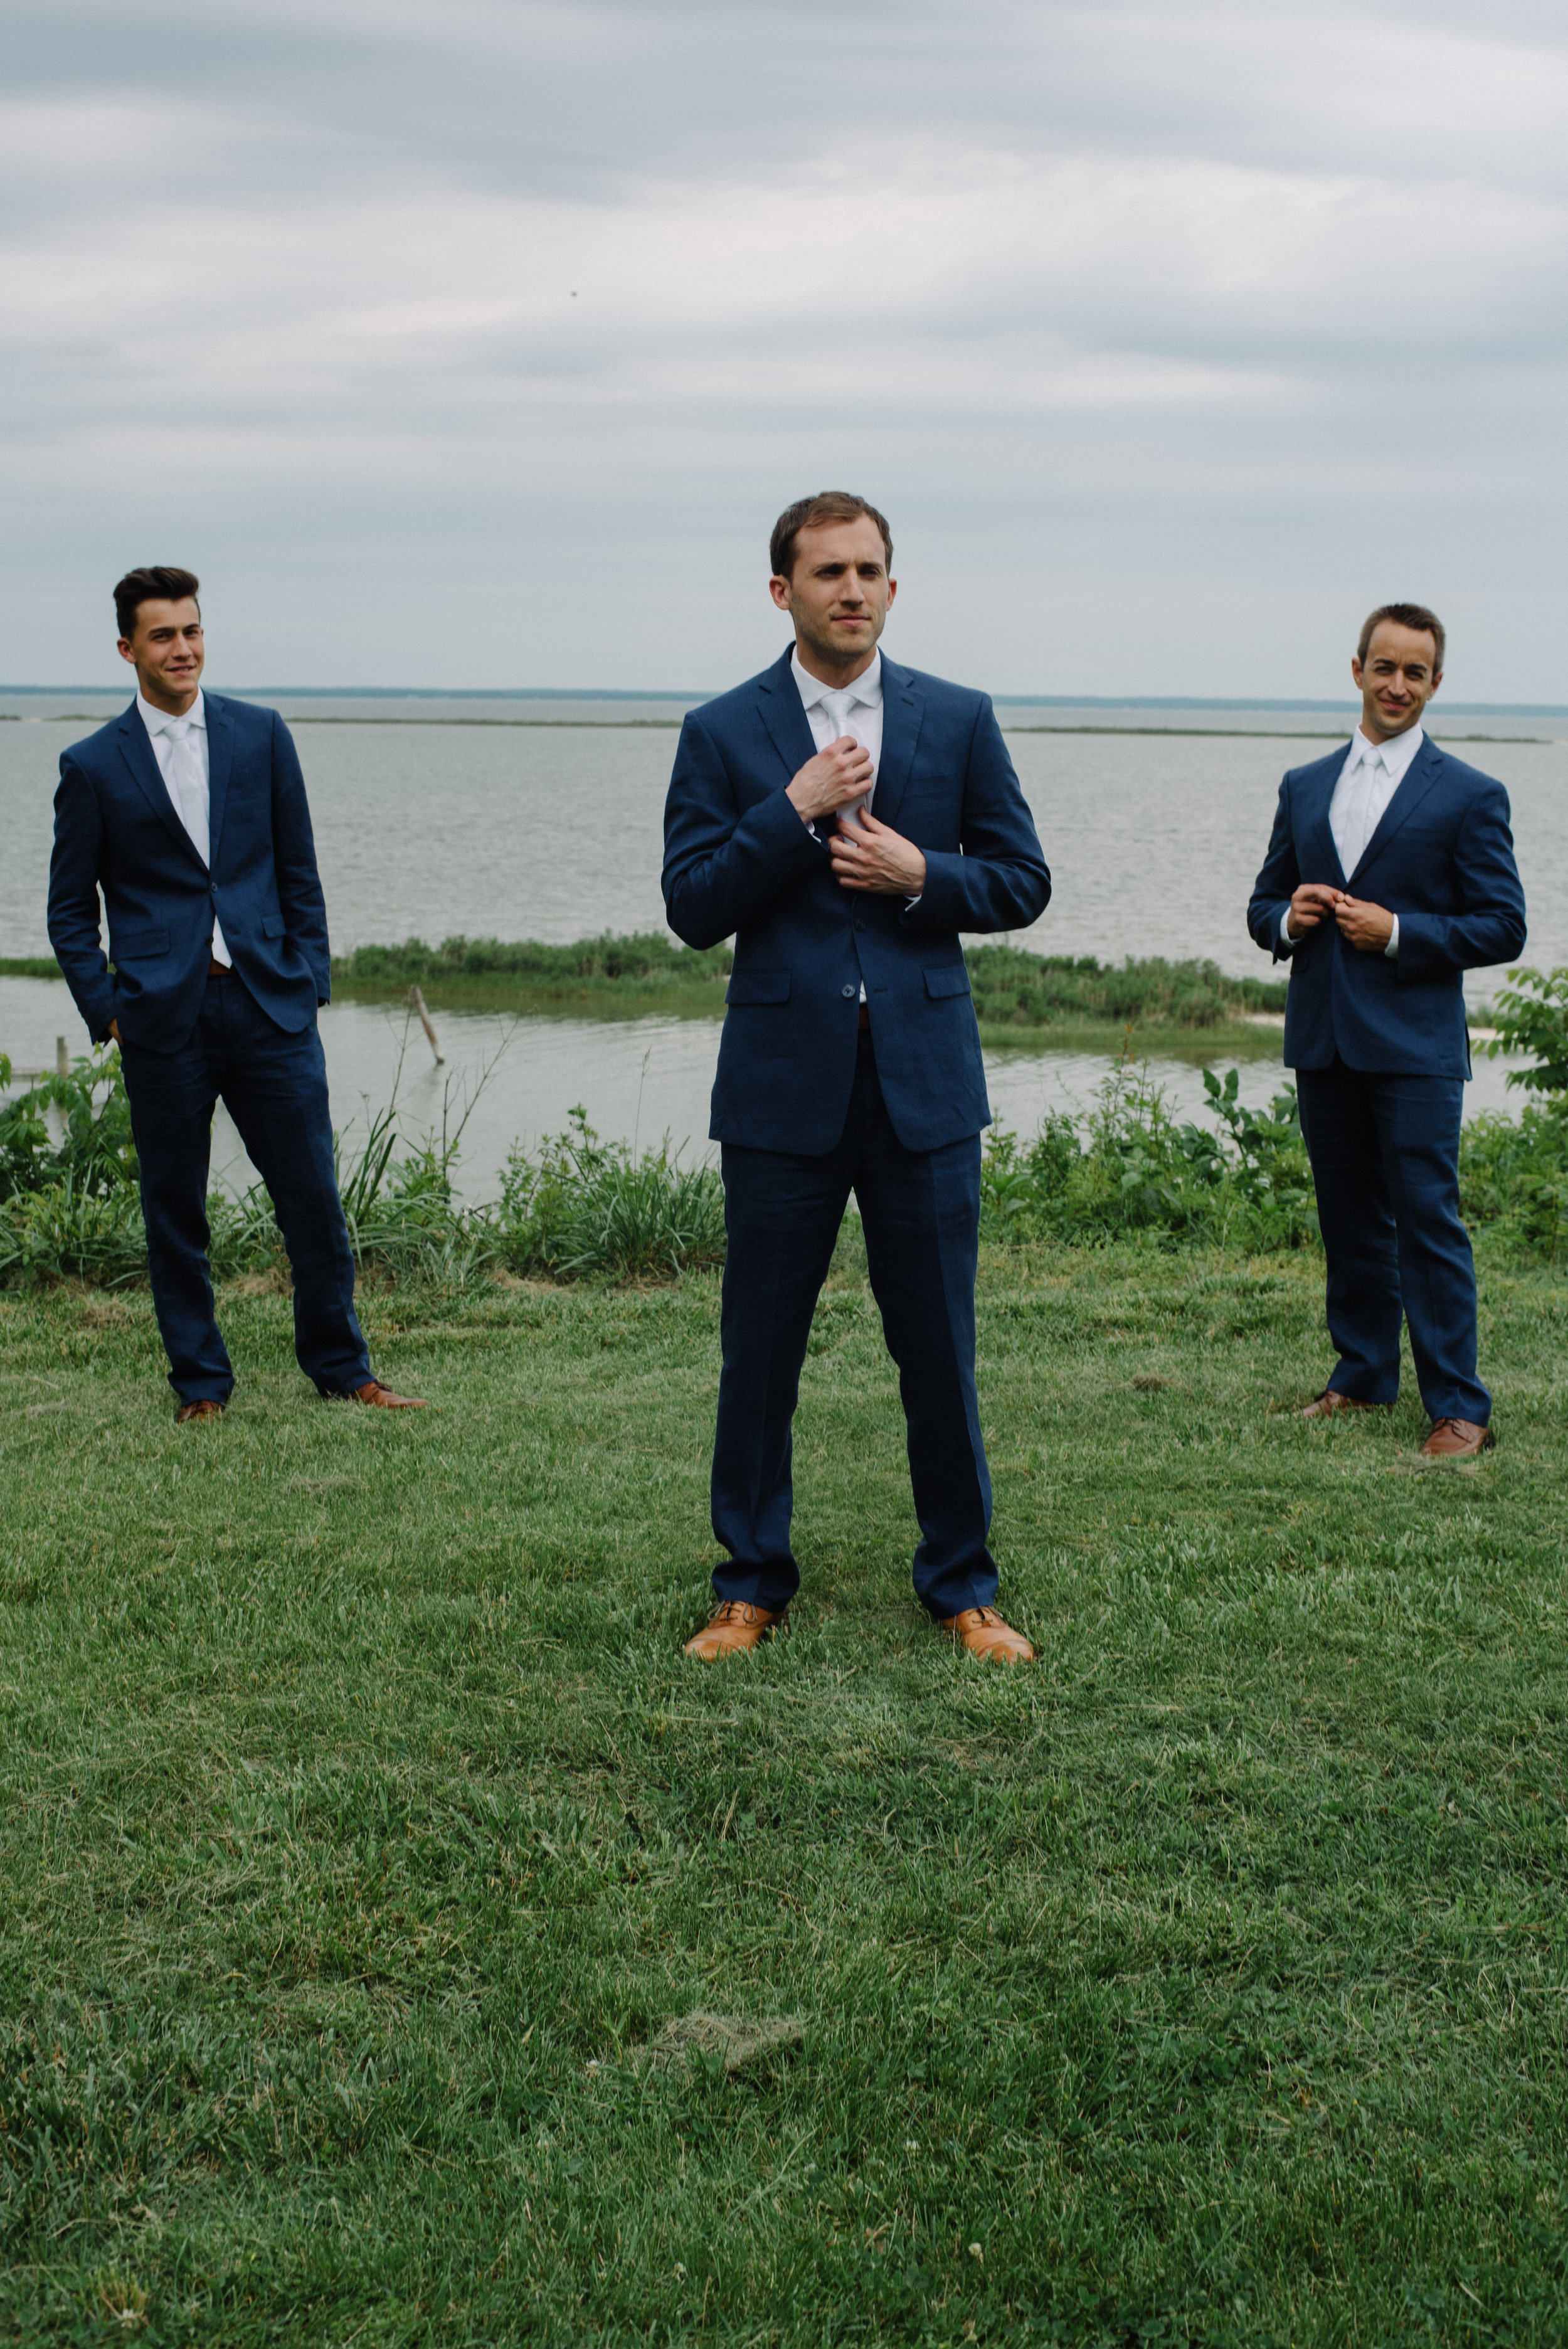 portraits-groomsmen-2.jpg